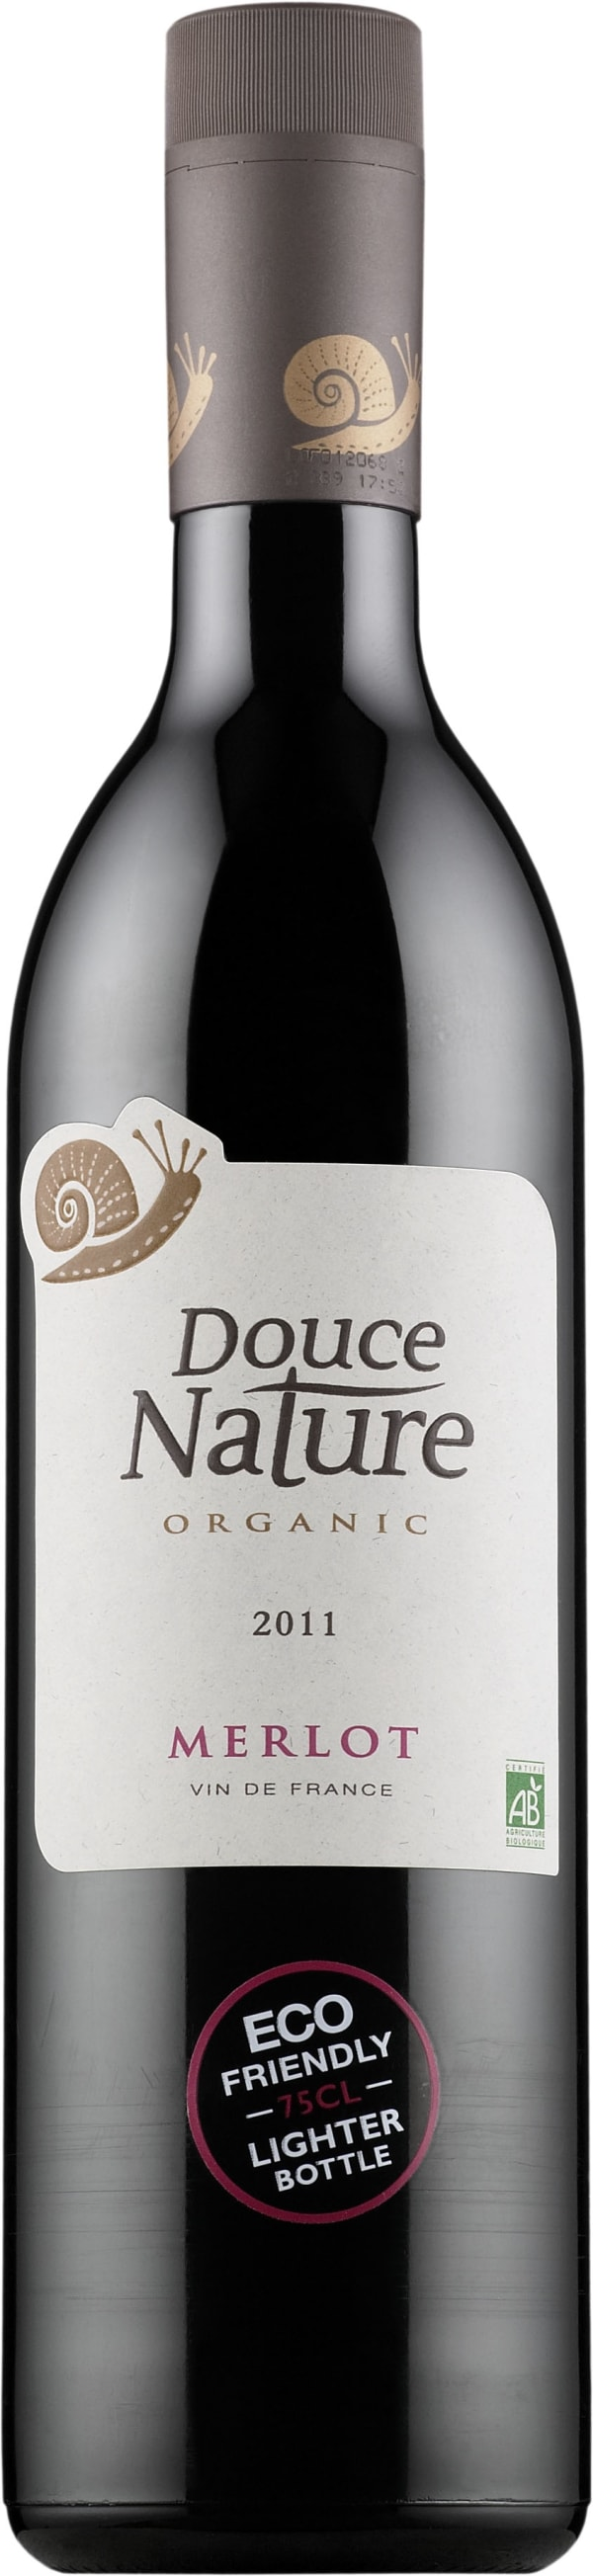 Douce Nature Organic Merlot 2015 plastic bottle